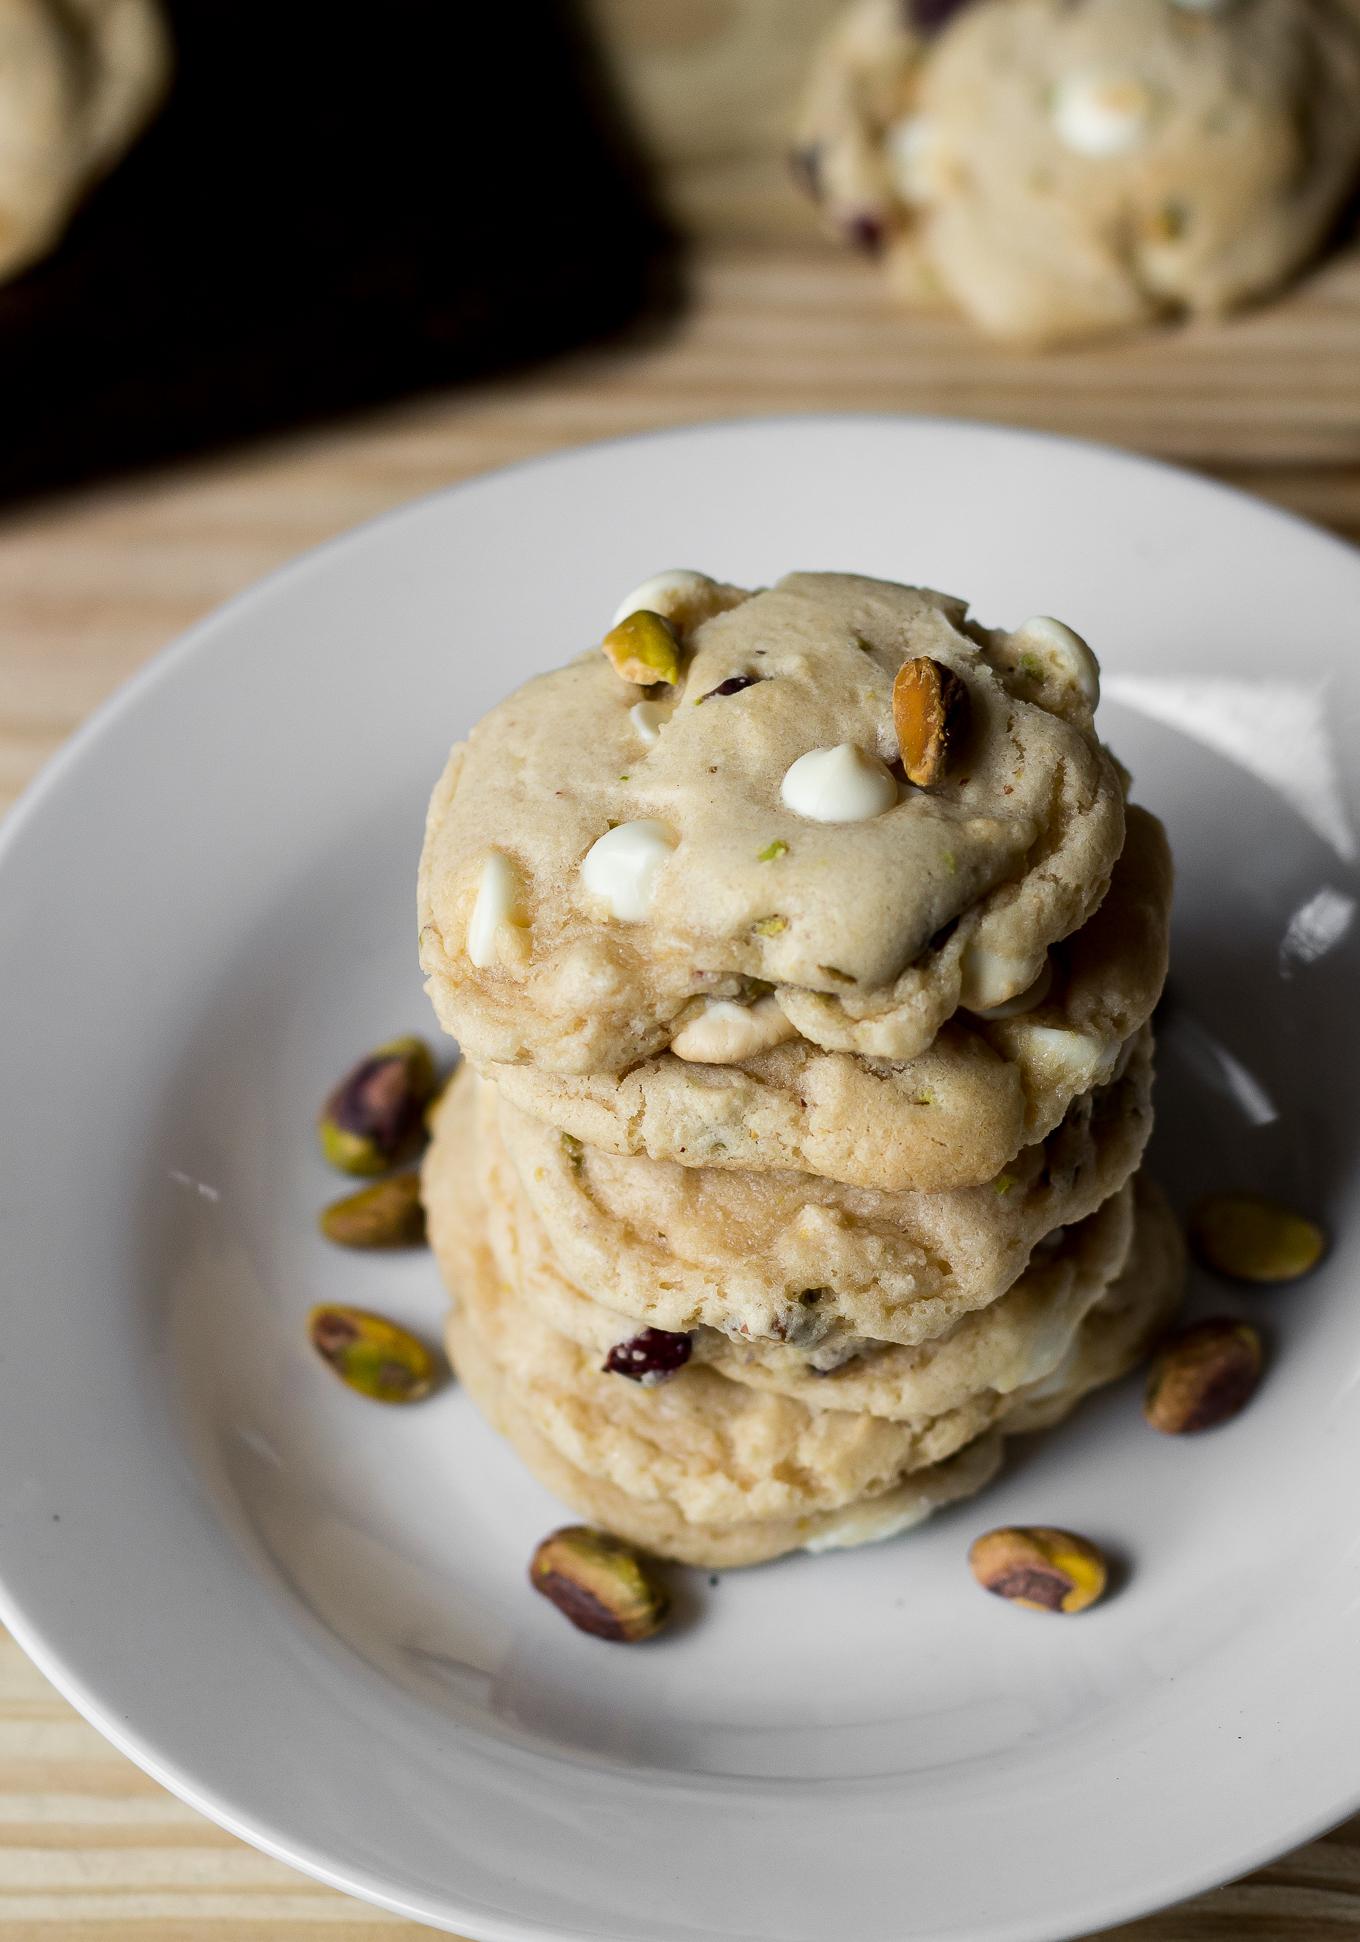 national pistachio day, cranberry white chocolate chip pistachio cookies, pistachio cookies, pistachio recipes